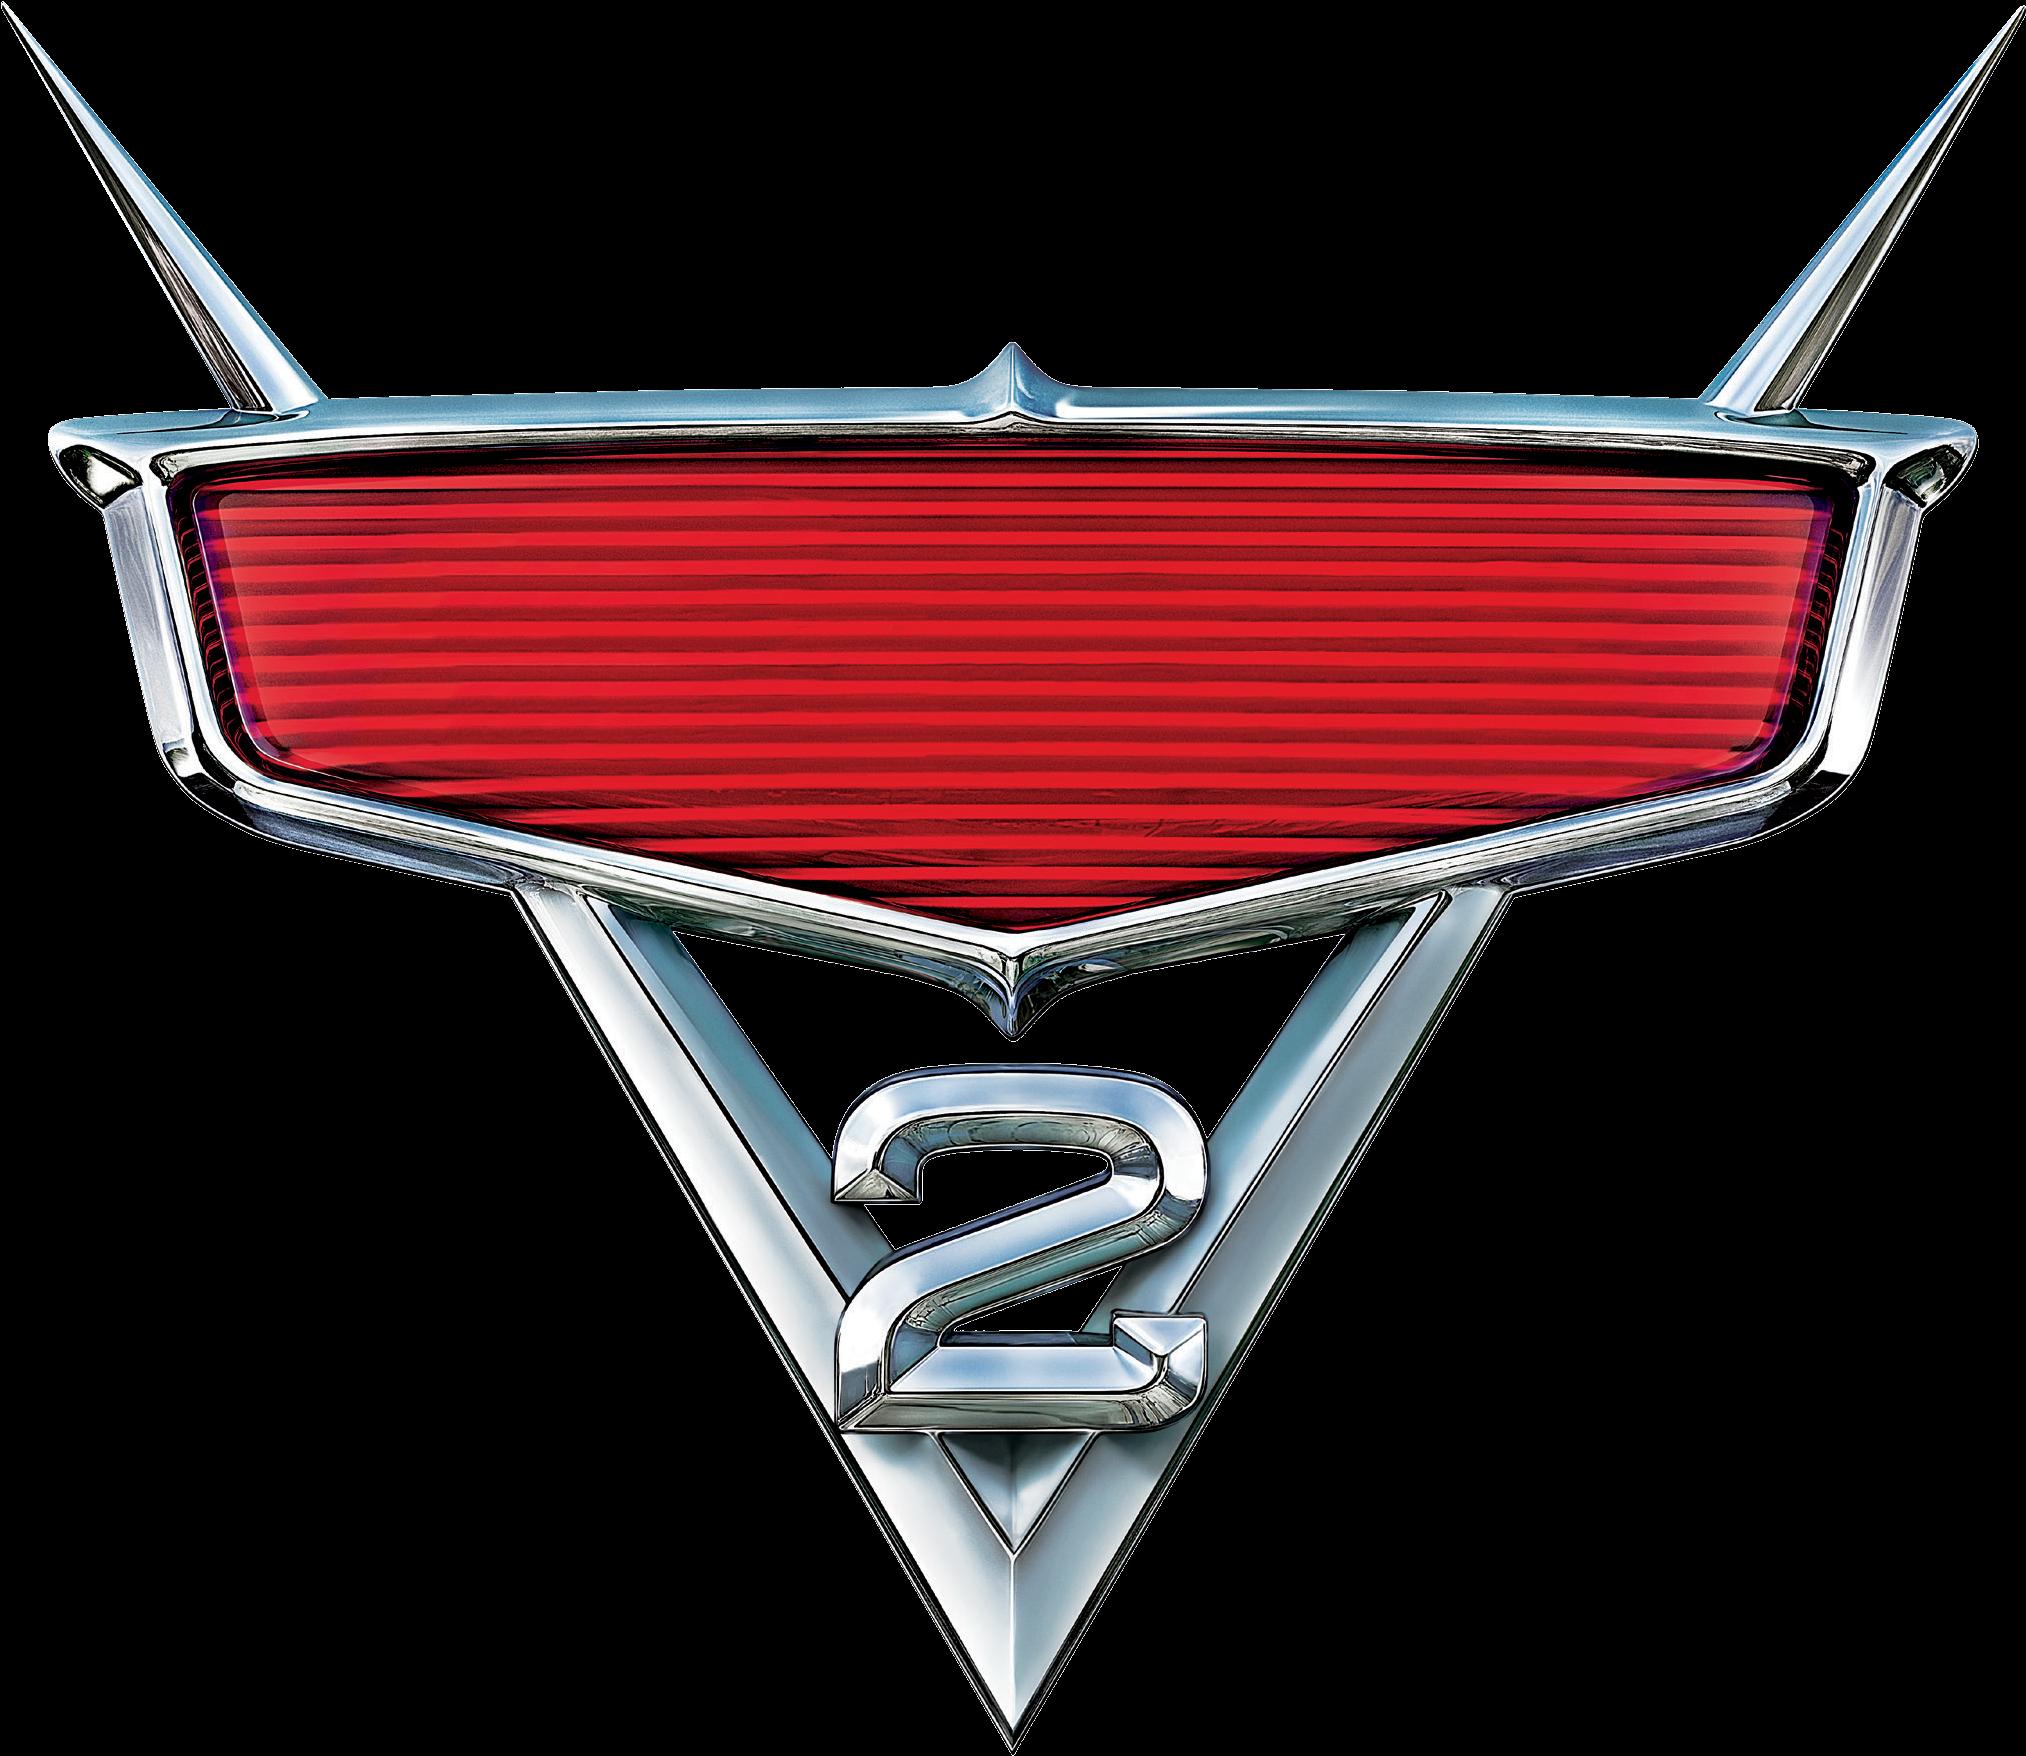 Cars com logo clipart vector freeuse download Cars 2 Logo Vector - Carros 2 Disney Logo Clipart - Full Size ... vector freeuse download